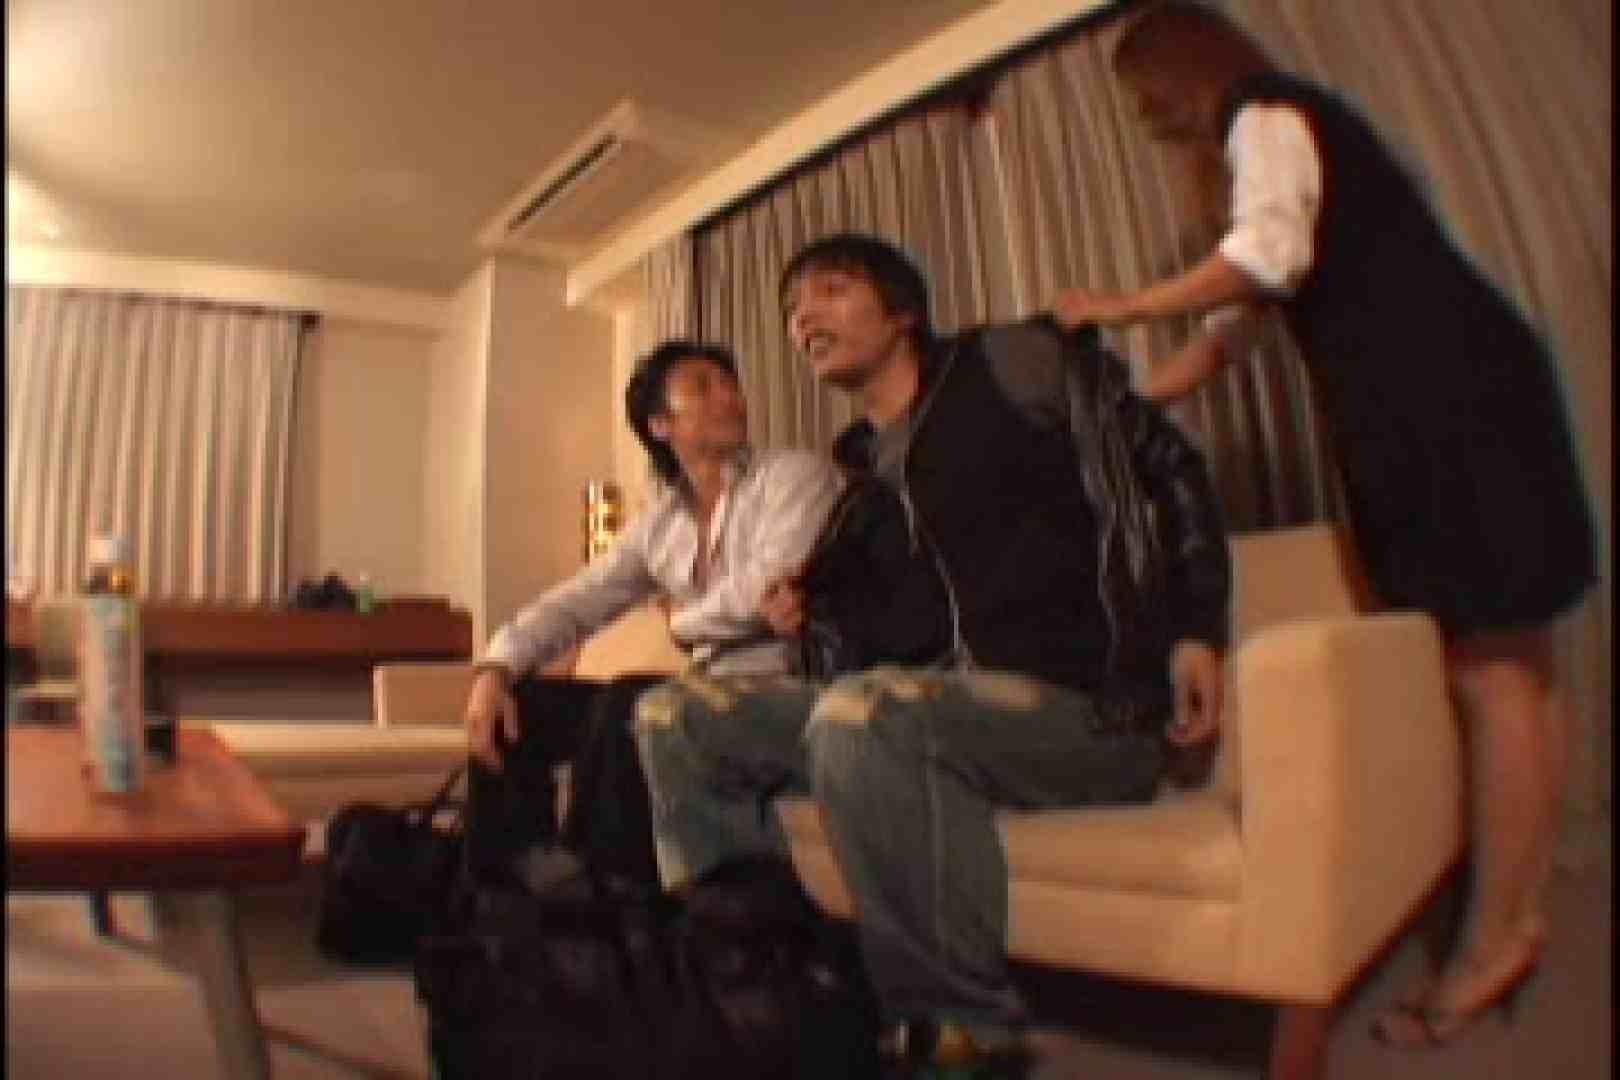 BEST OF イケメン!!男目線のガチSEX vol.04(対女性作品) ドキュメント ちんぽ画像 55画像 23